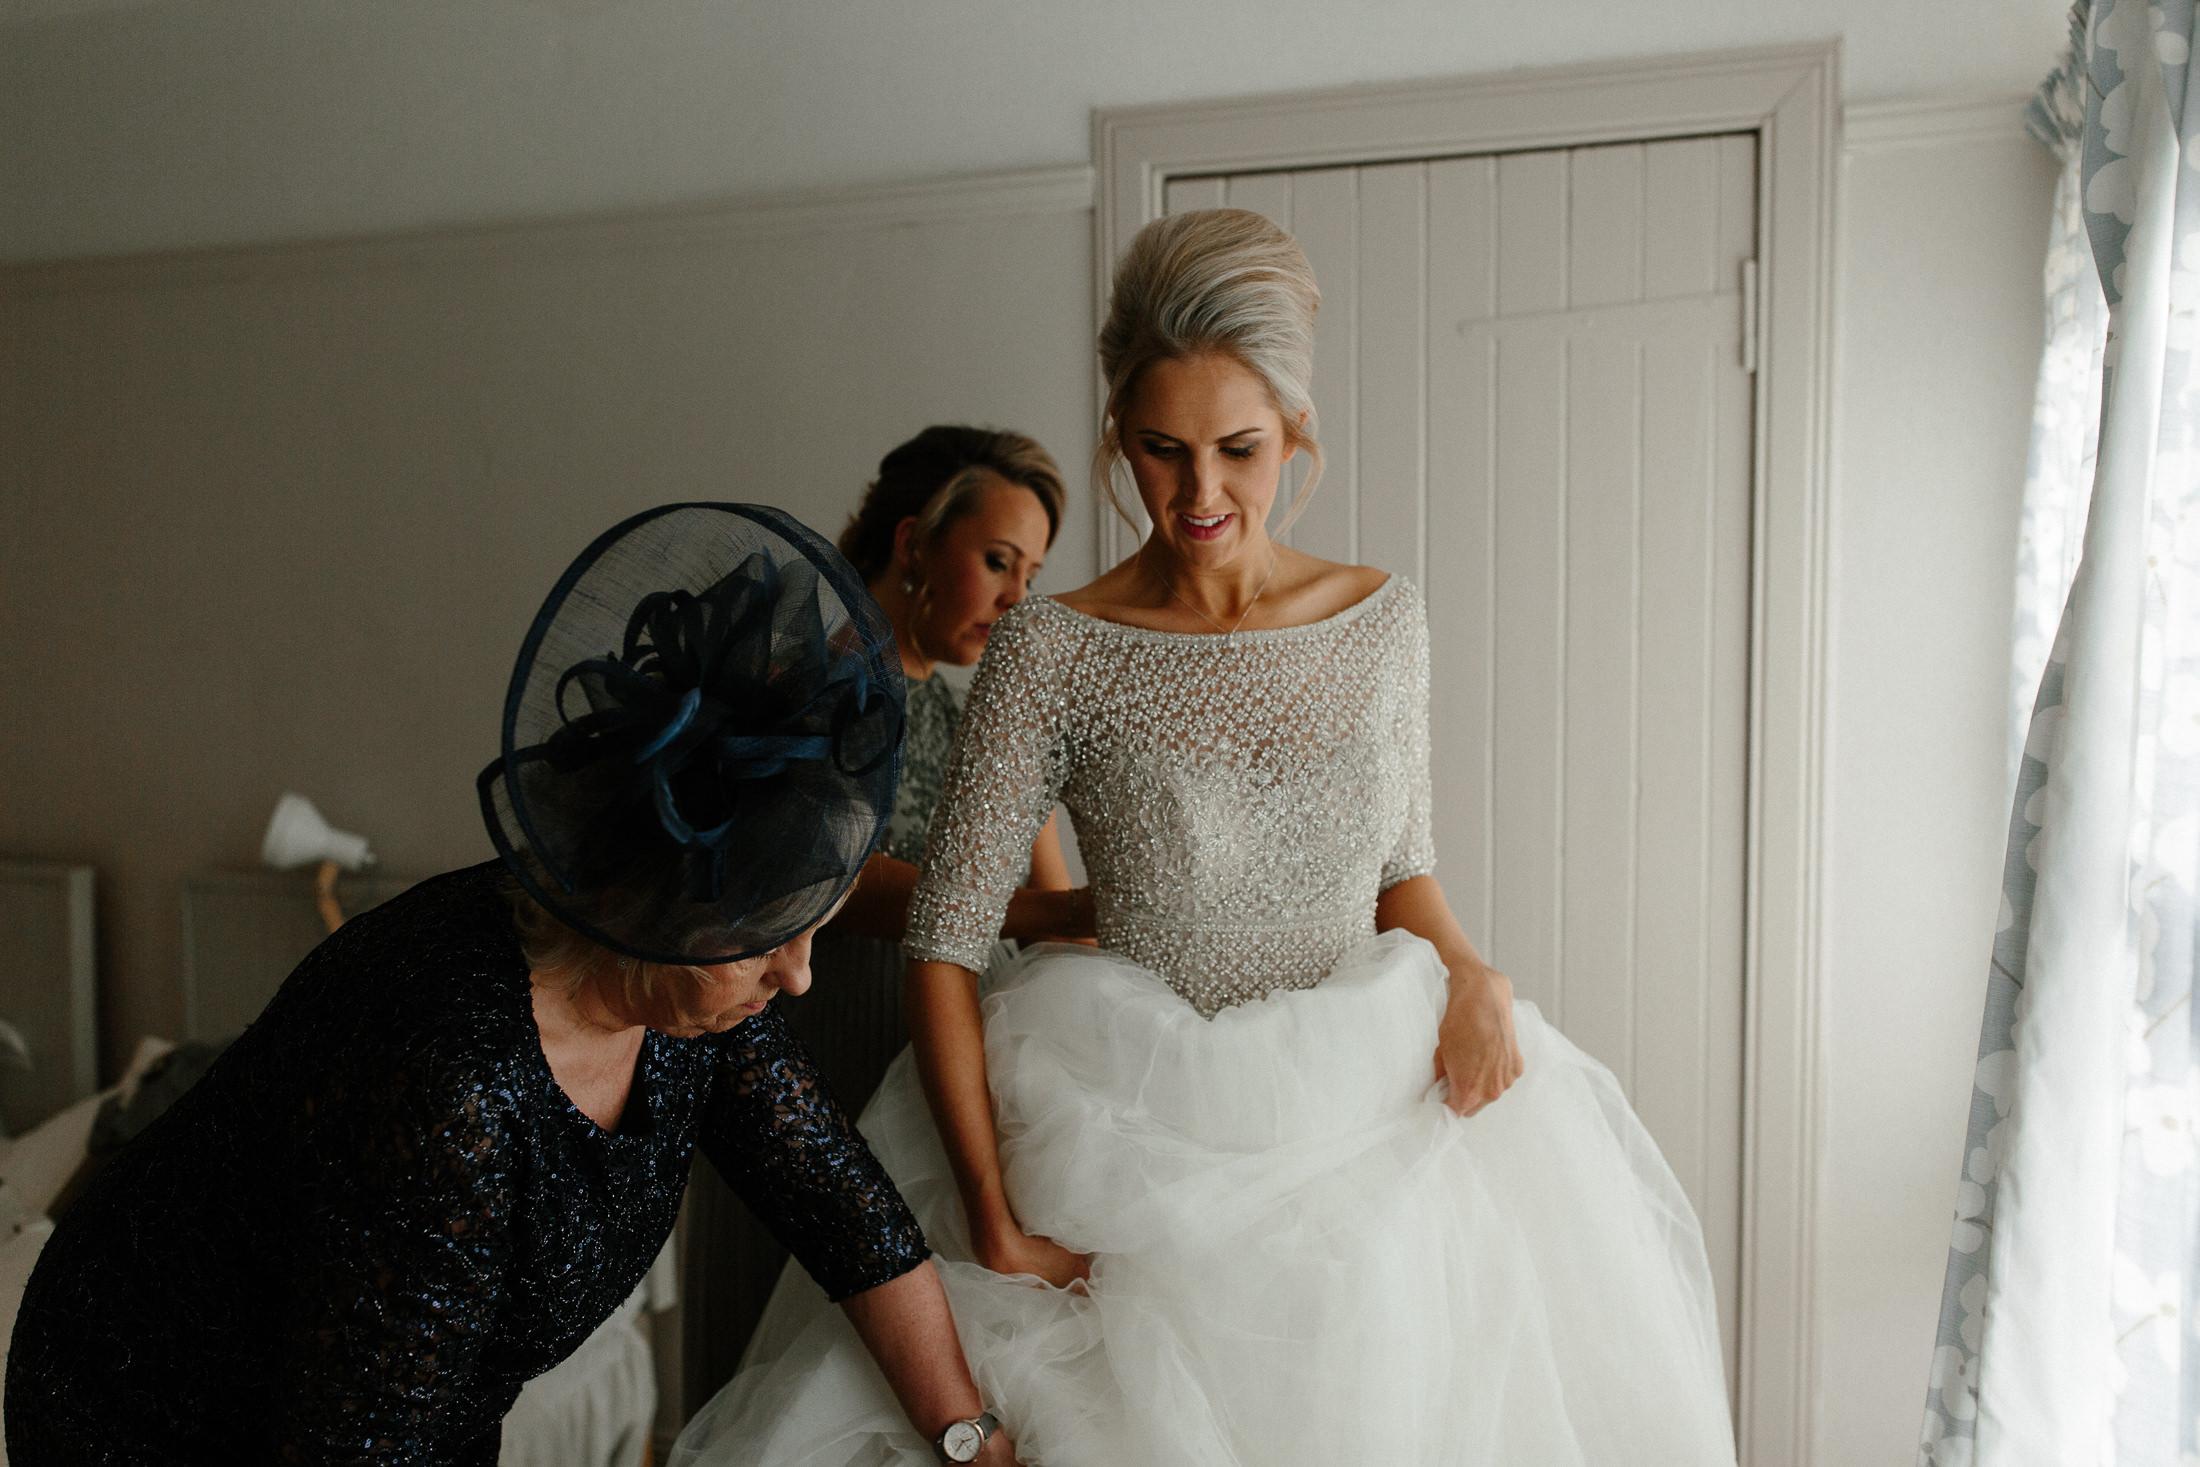 Kayleigh-Michael-Cow-Shed-Cowshed-Crail-Fife-Coastal-Rustic-Barn-Lianne-Mackay-Wedding-Photography-Photographer-Edinburgh-Glasgow-Scotland-WEB-RES-152.jpg